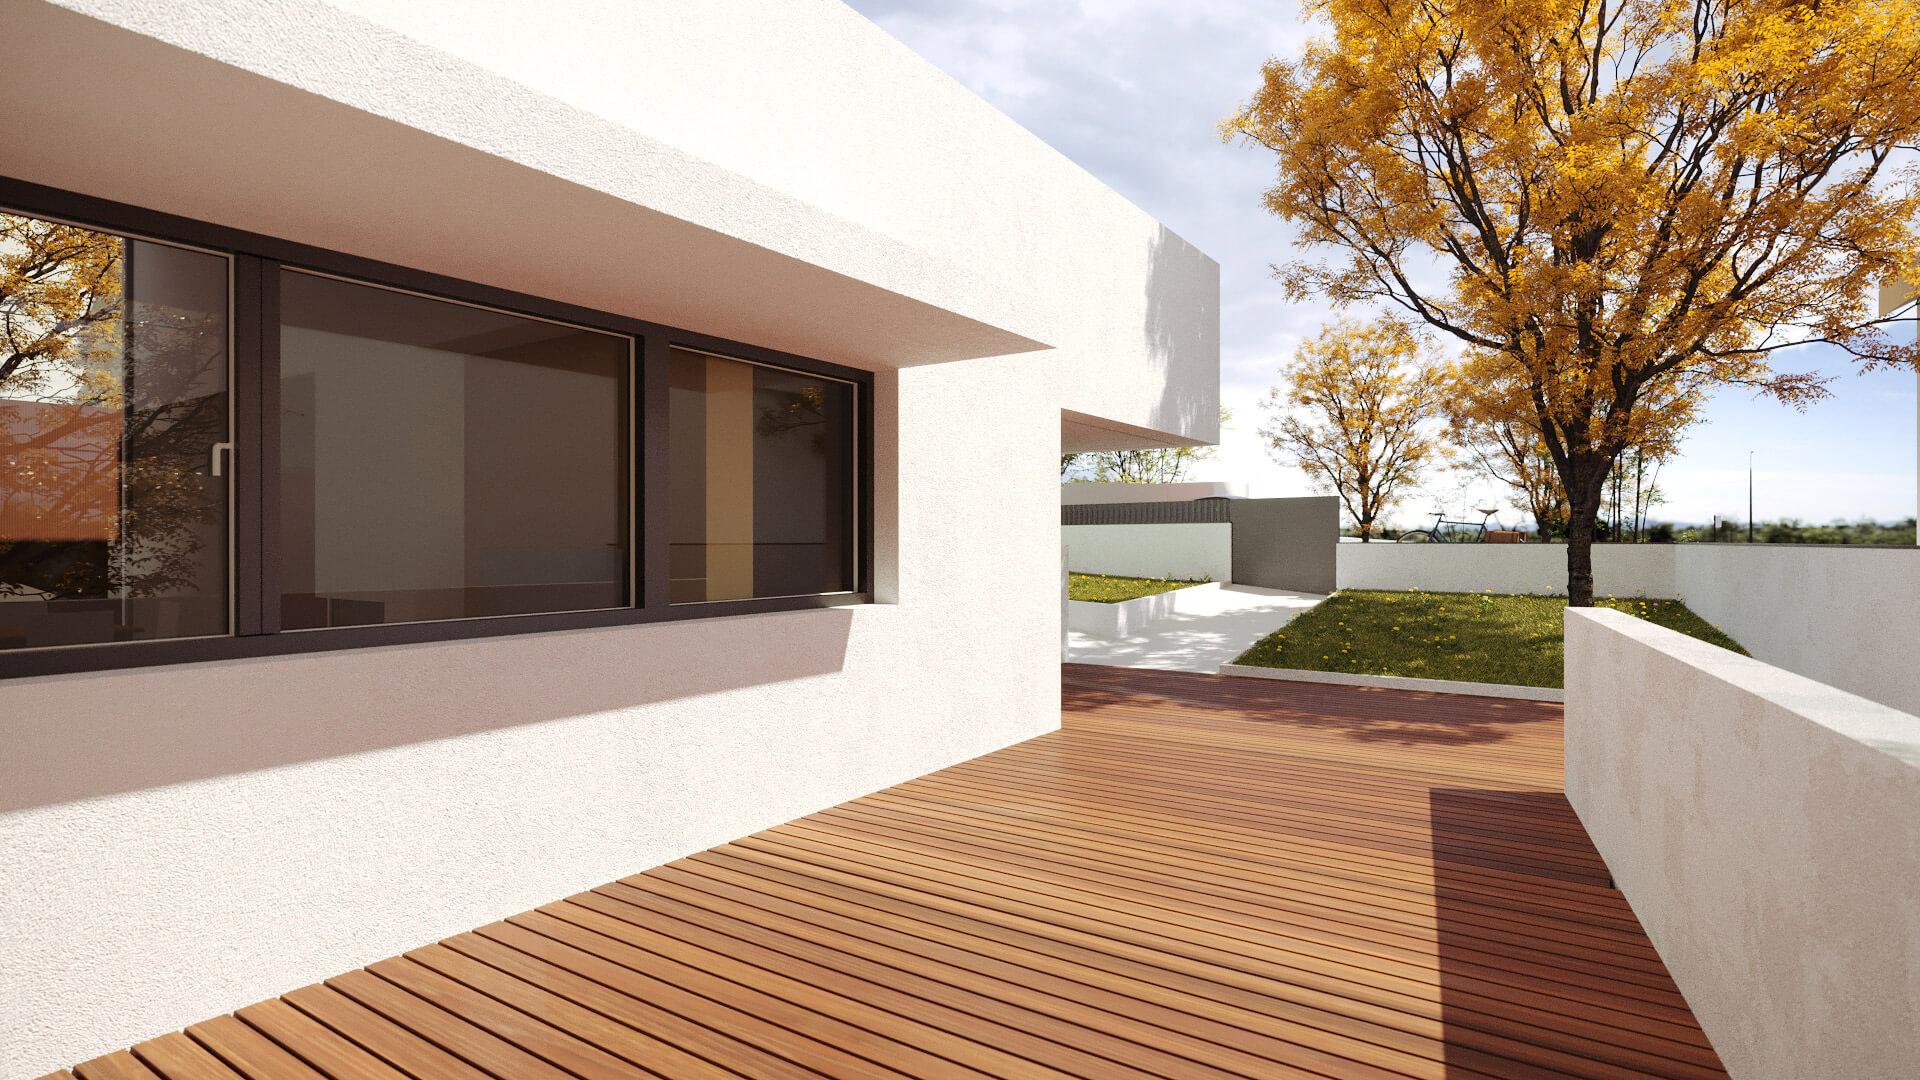 rcarquitectura - projecto habitação